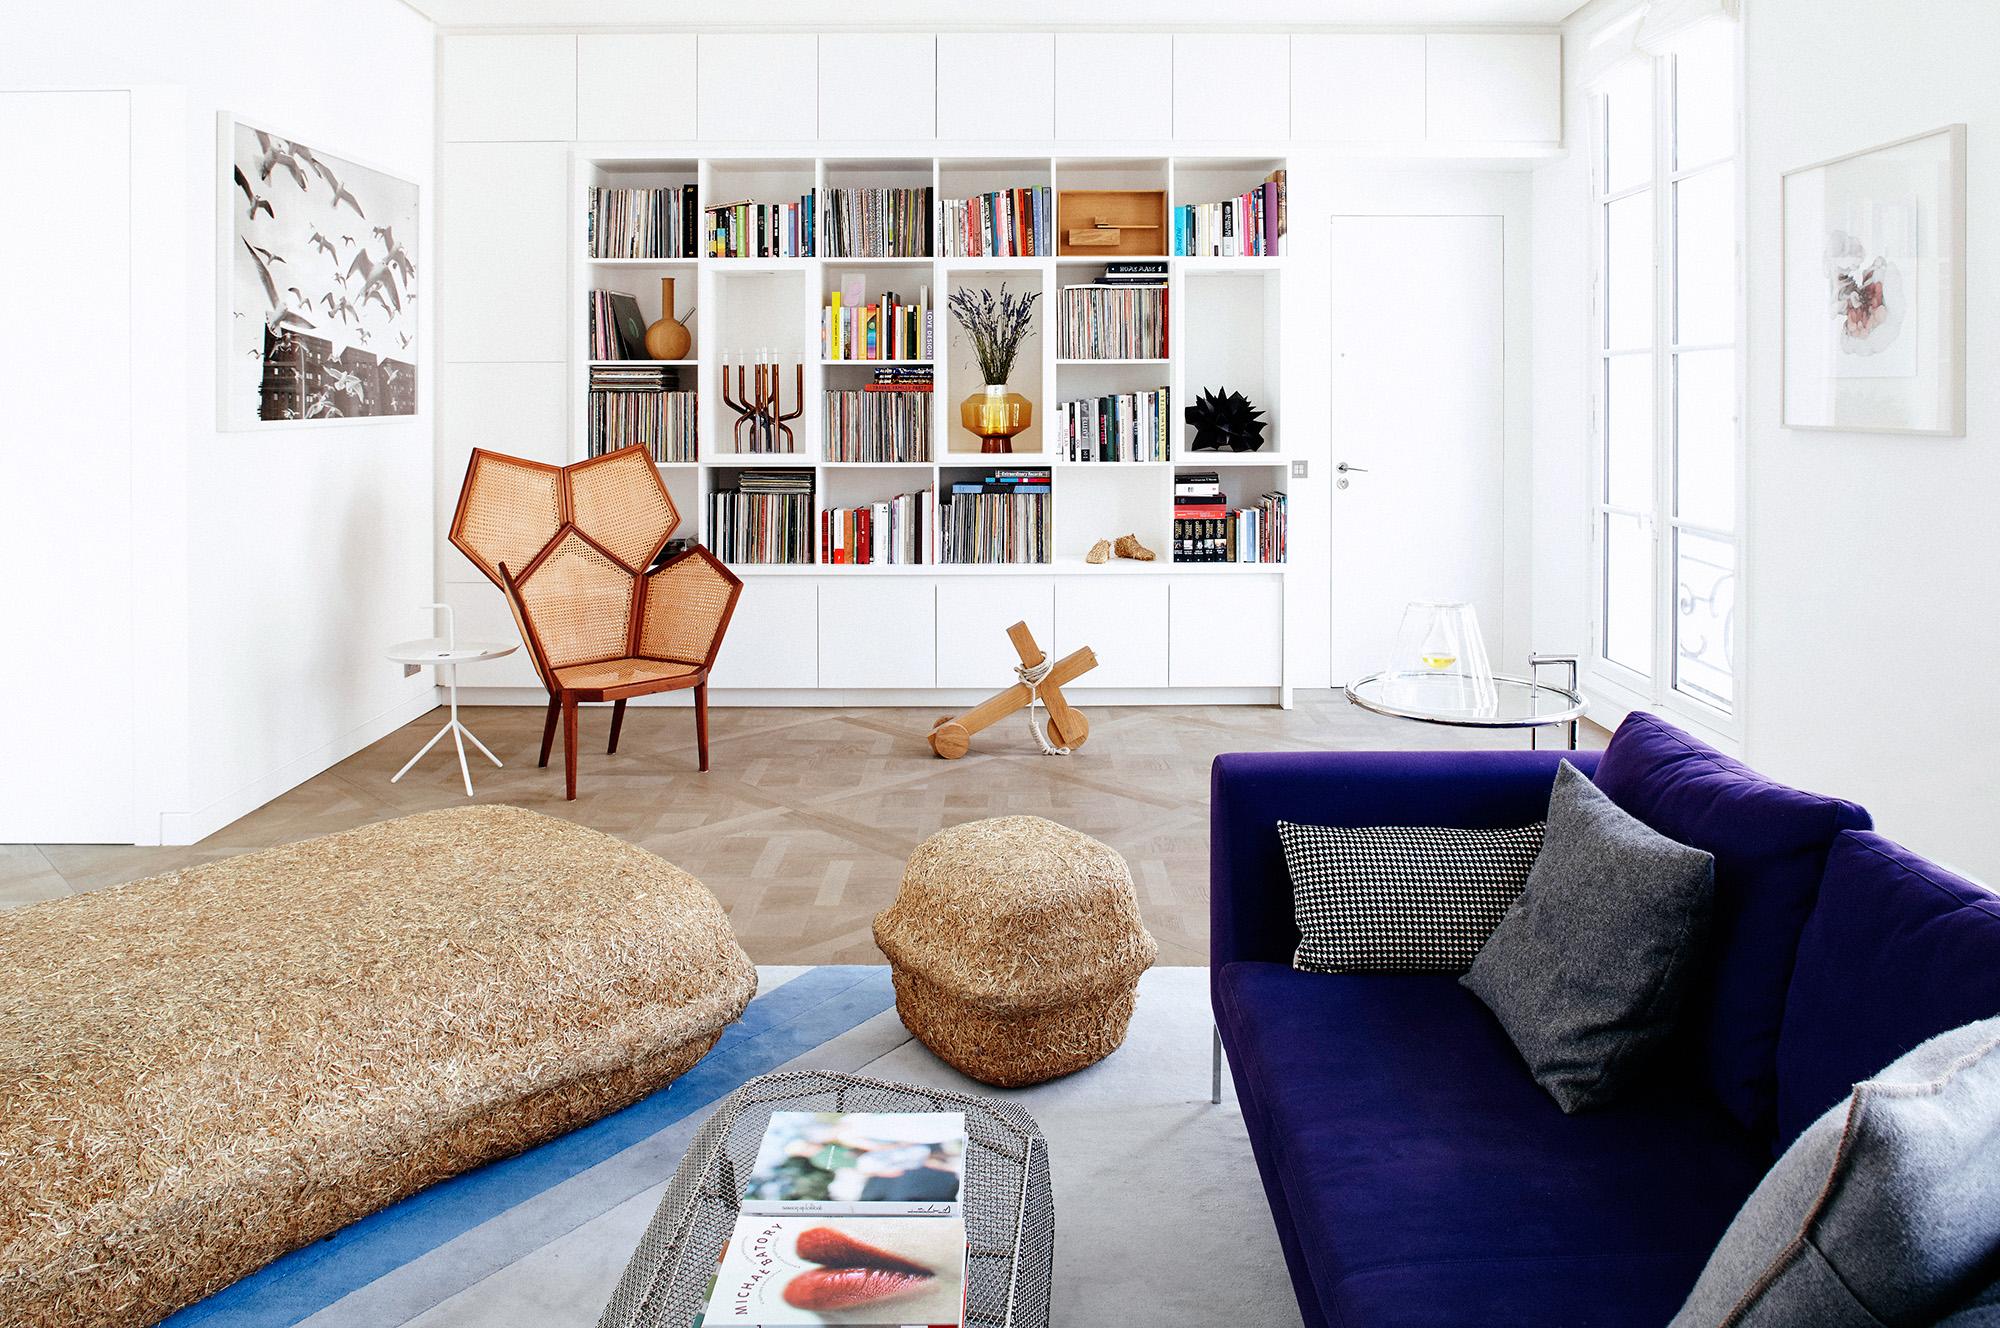 Paola Bjäringer, Collectible interiors & Design. Paris